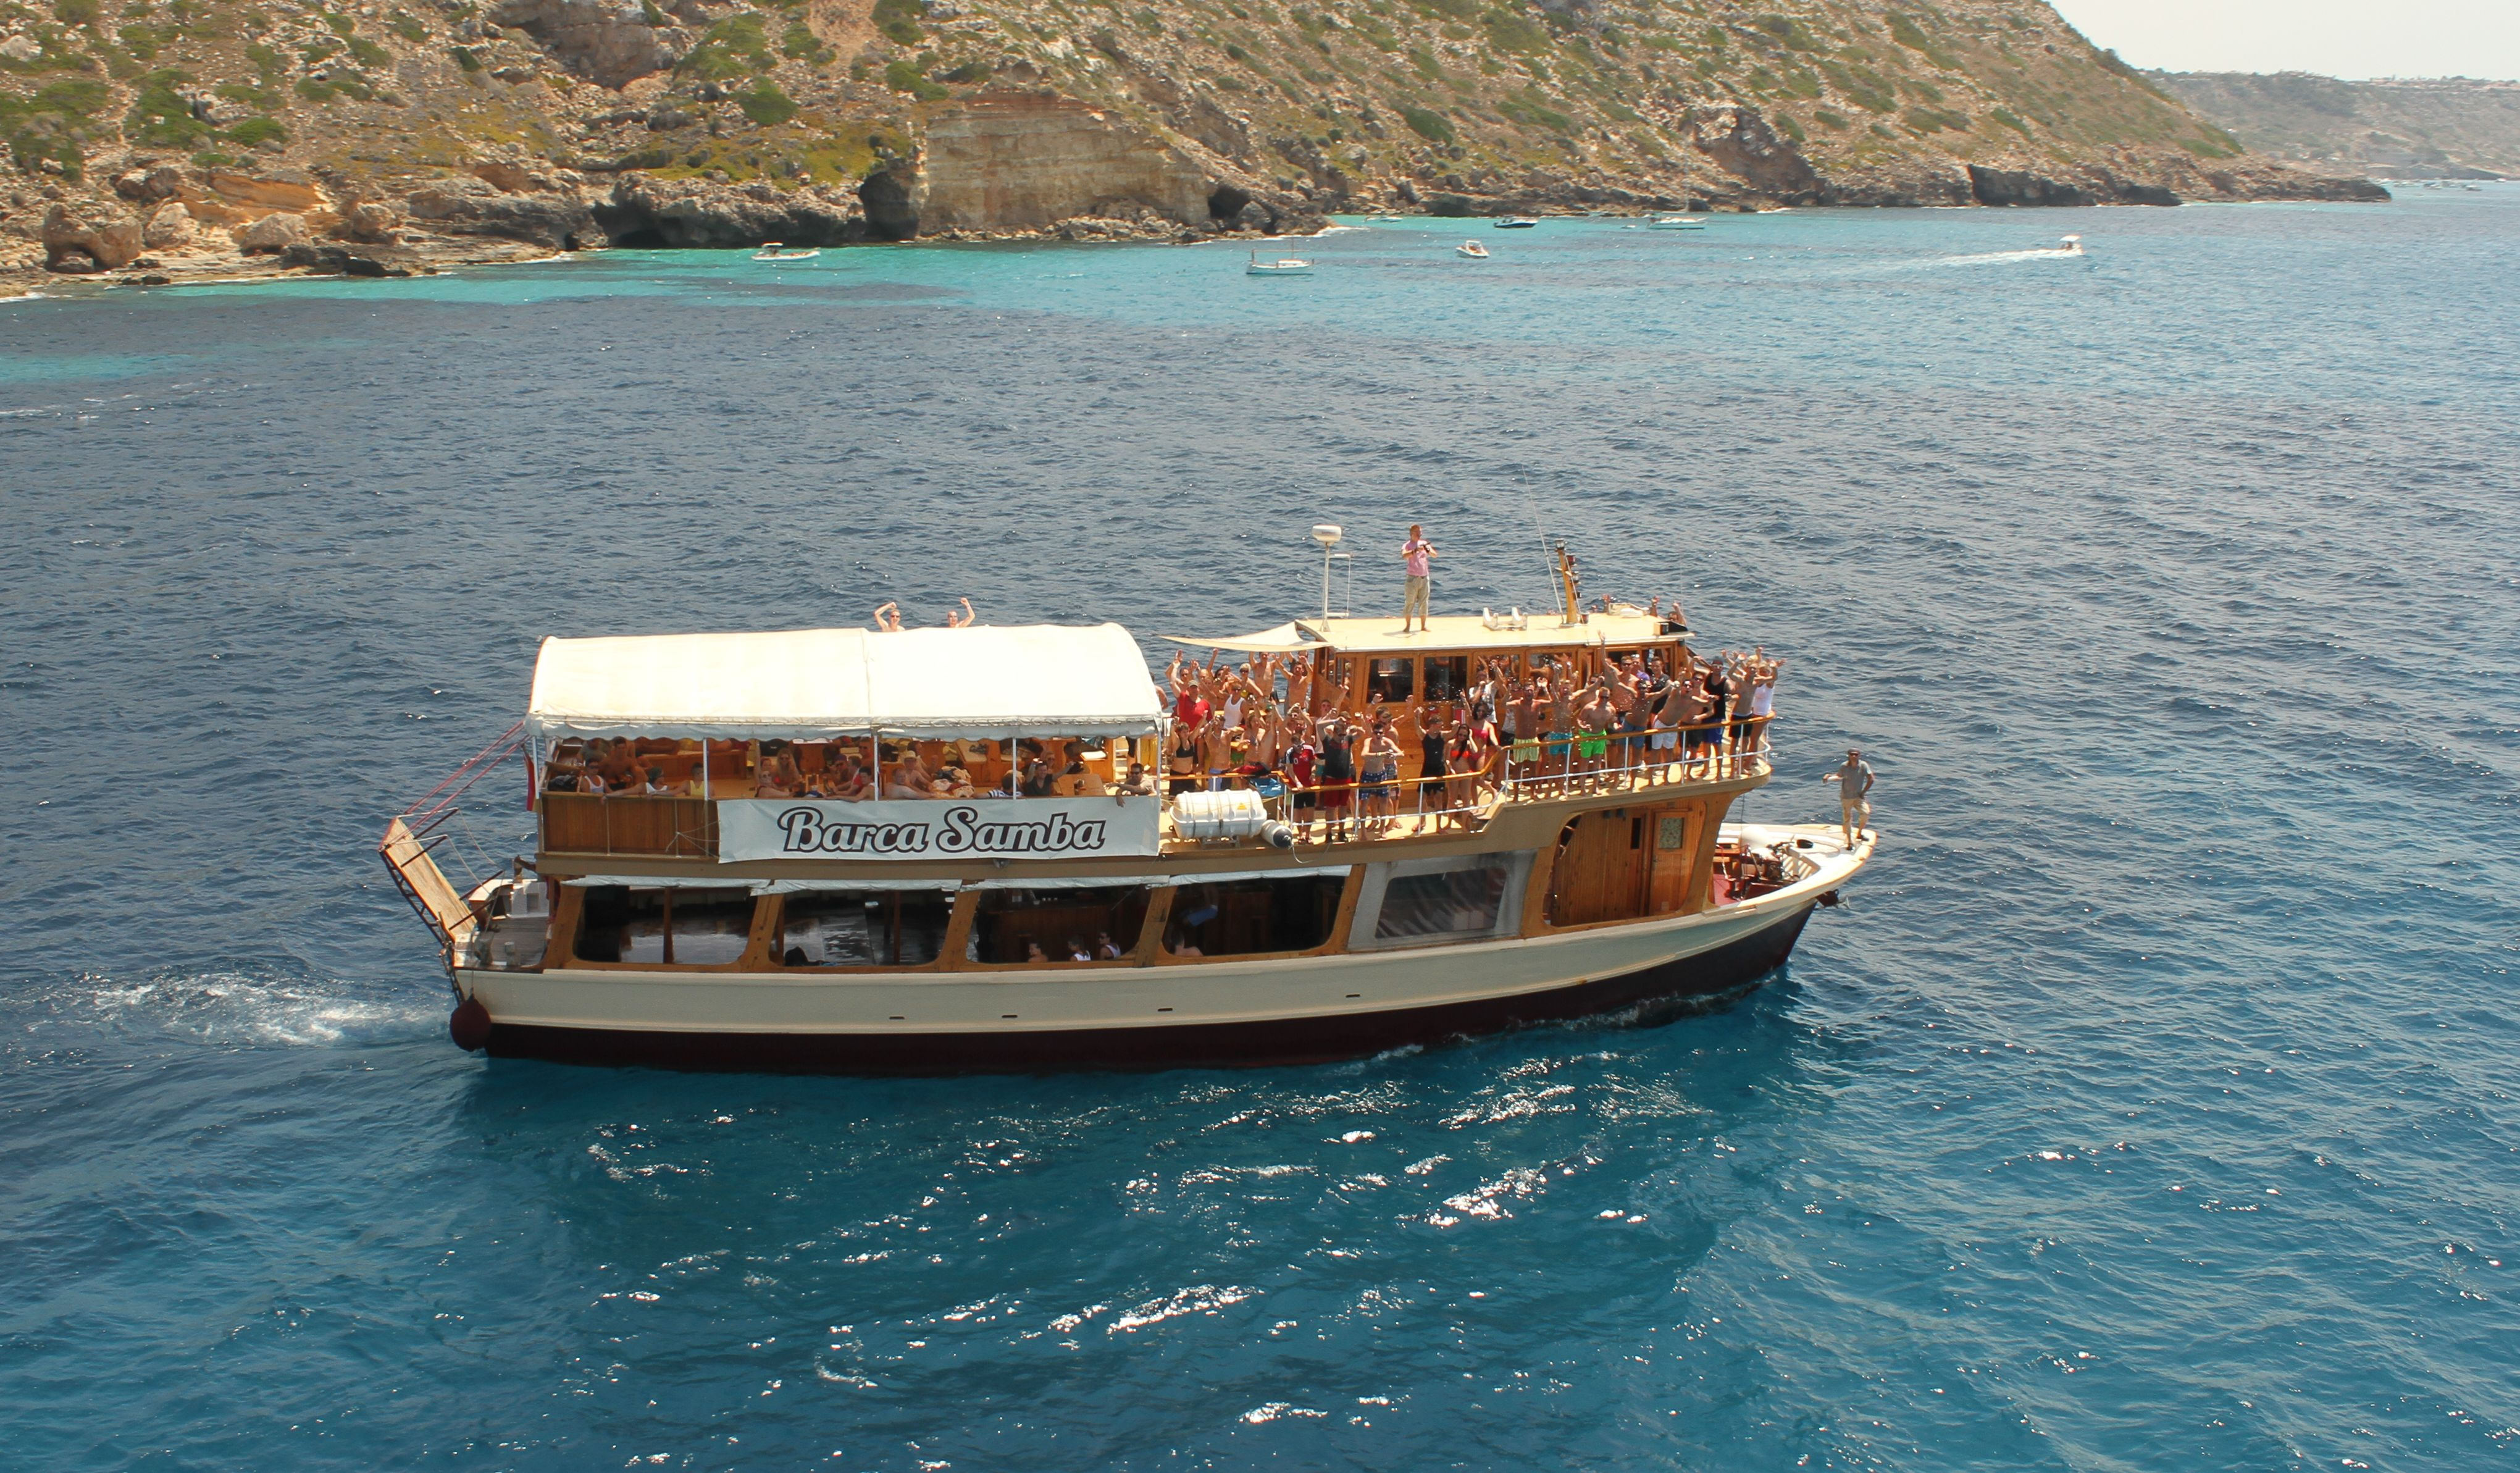 Party Boat en Mallorca - barco-samba-01.jpg